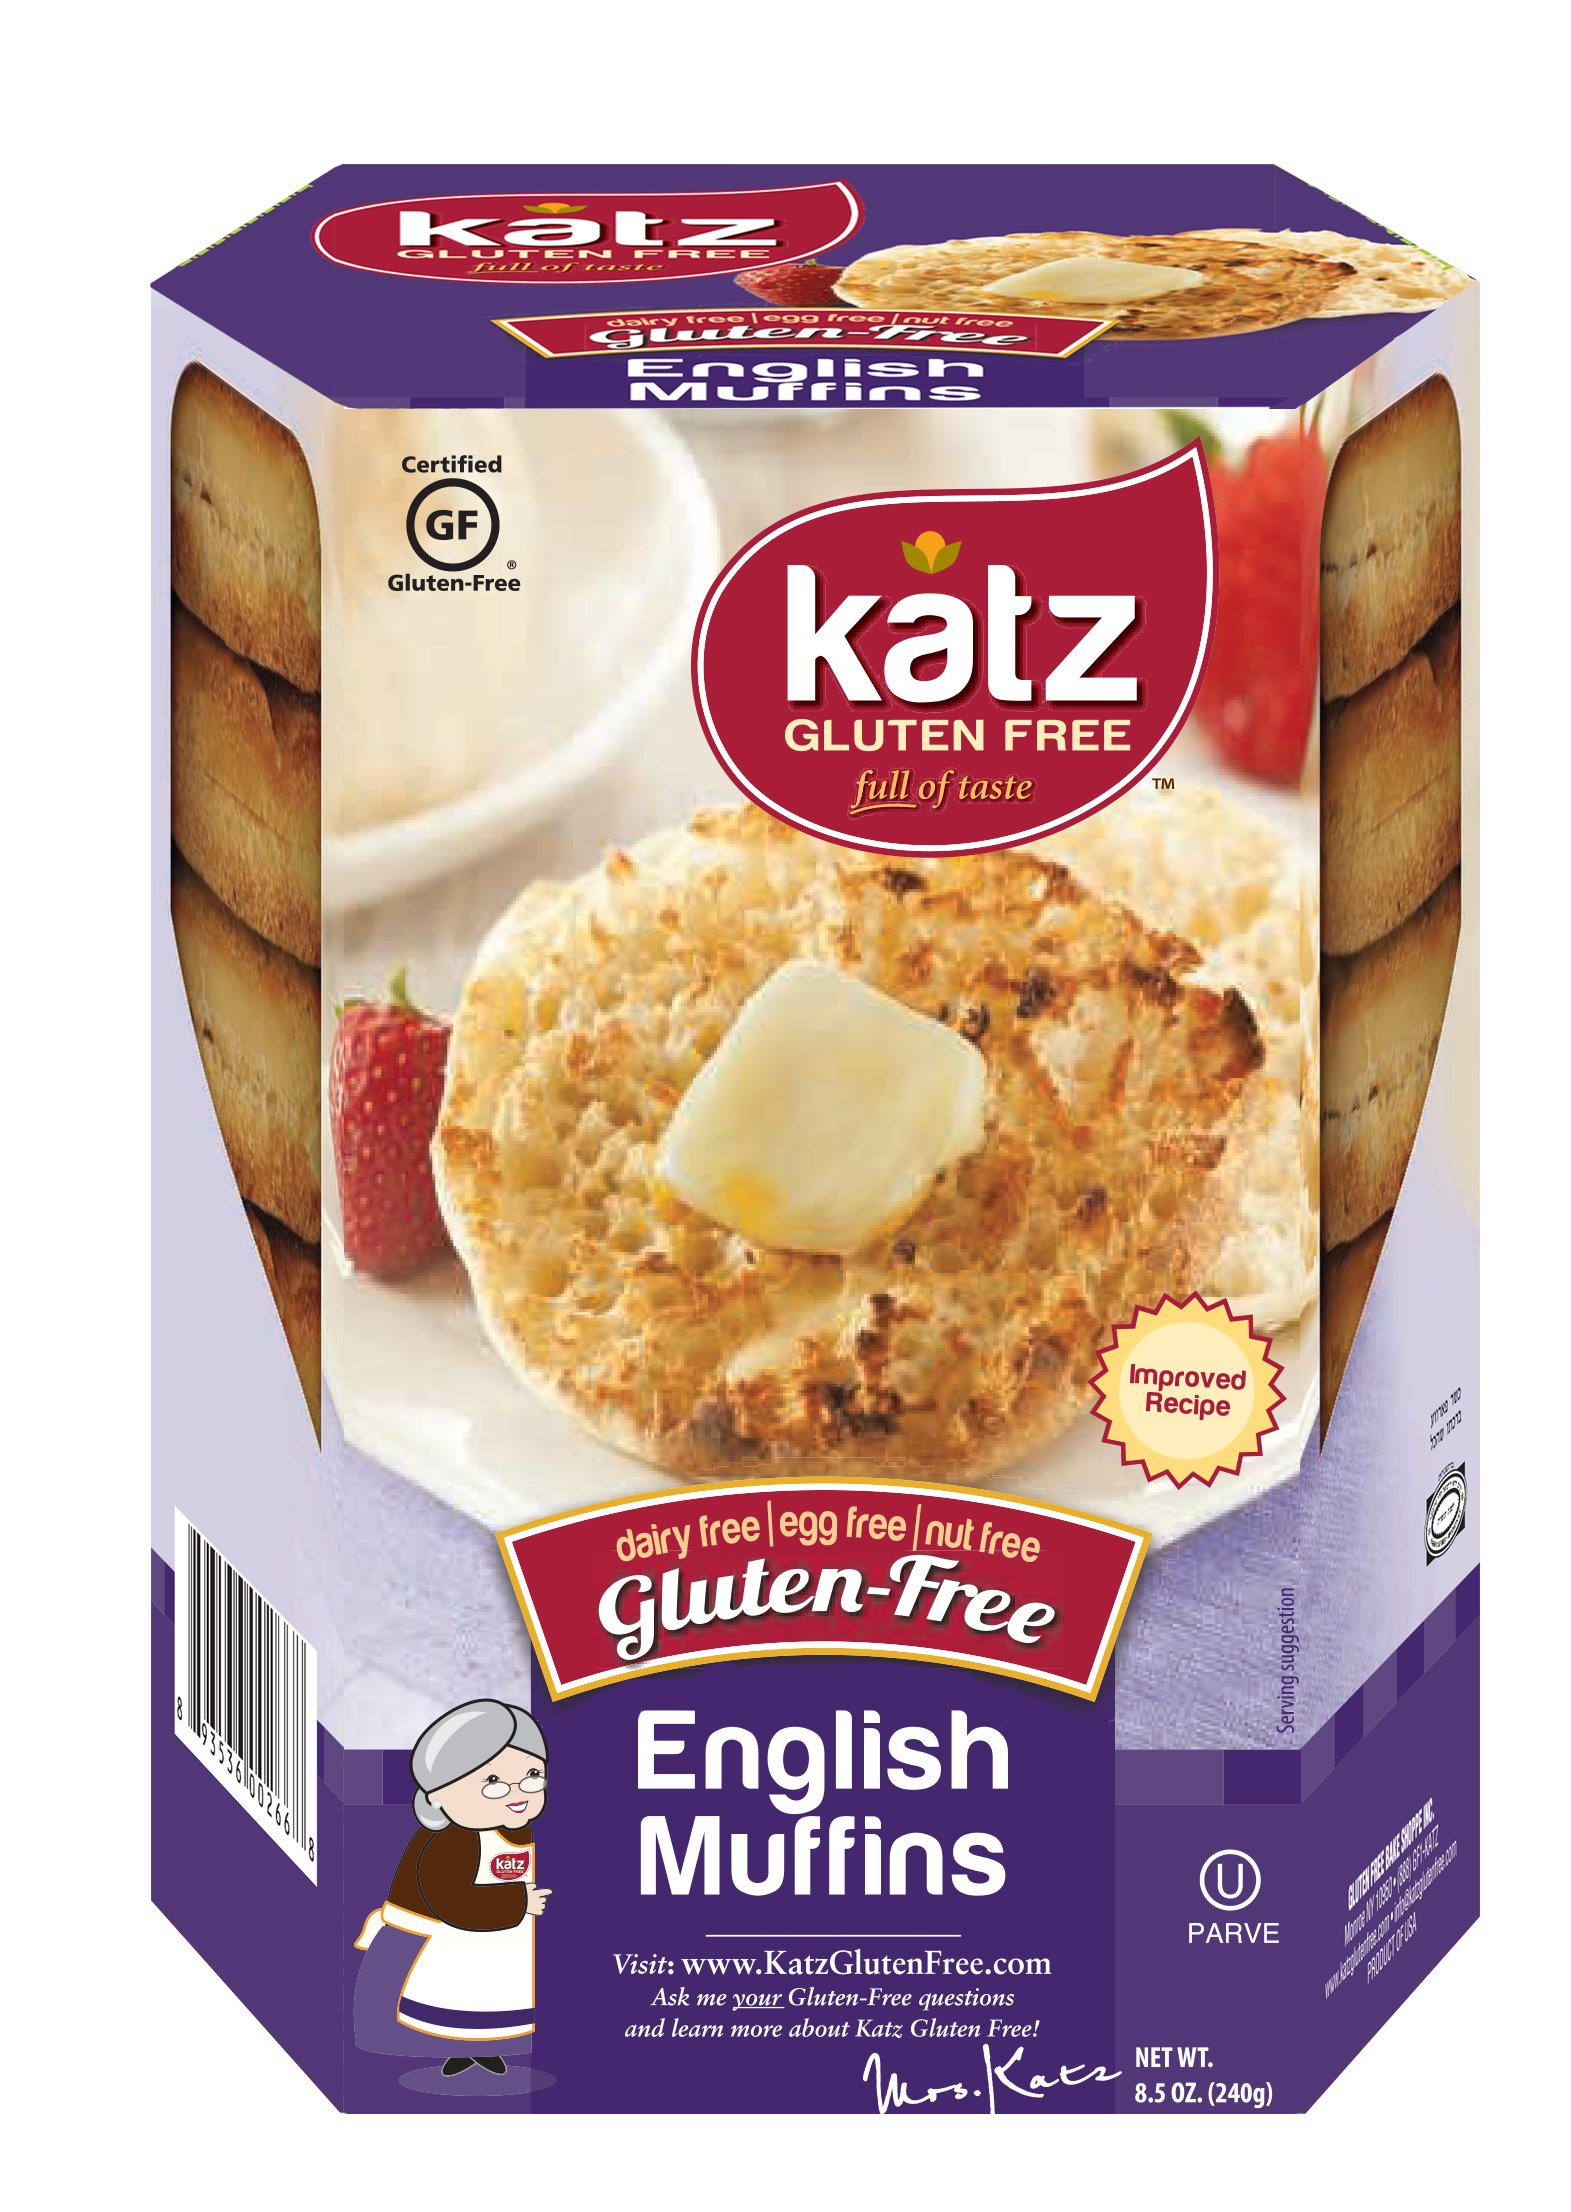 Katz Gluten Free English Muffins 8.5 Ounce (Pack of 1)